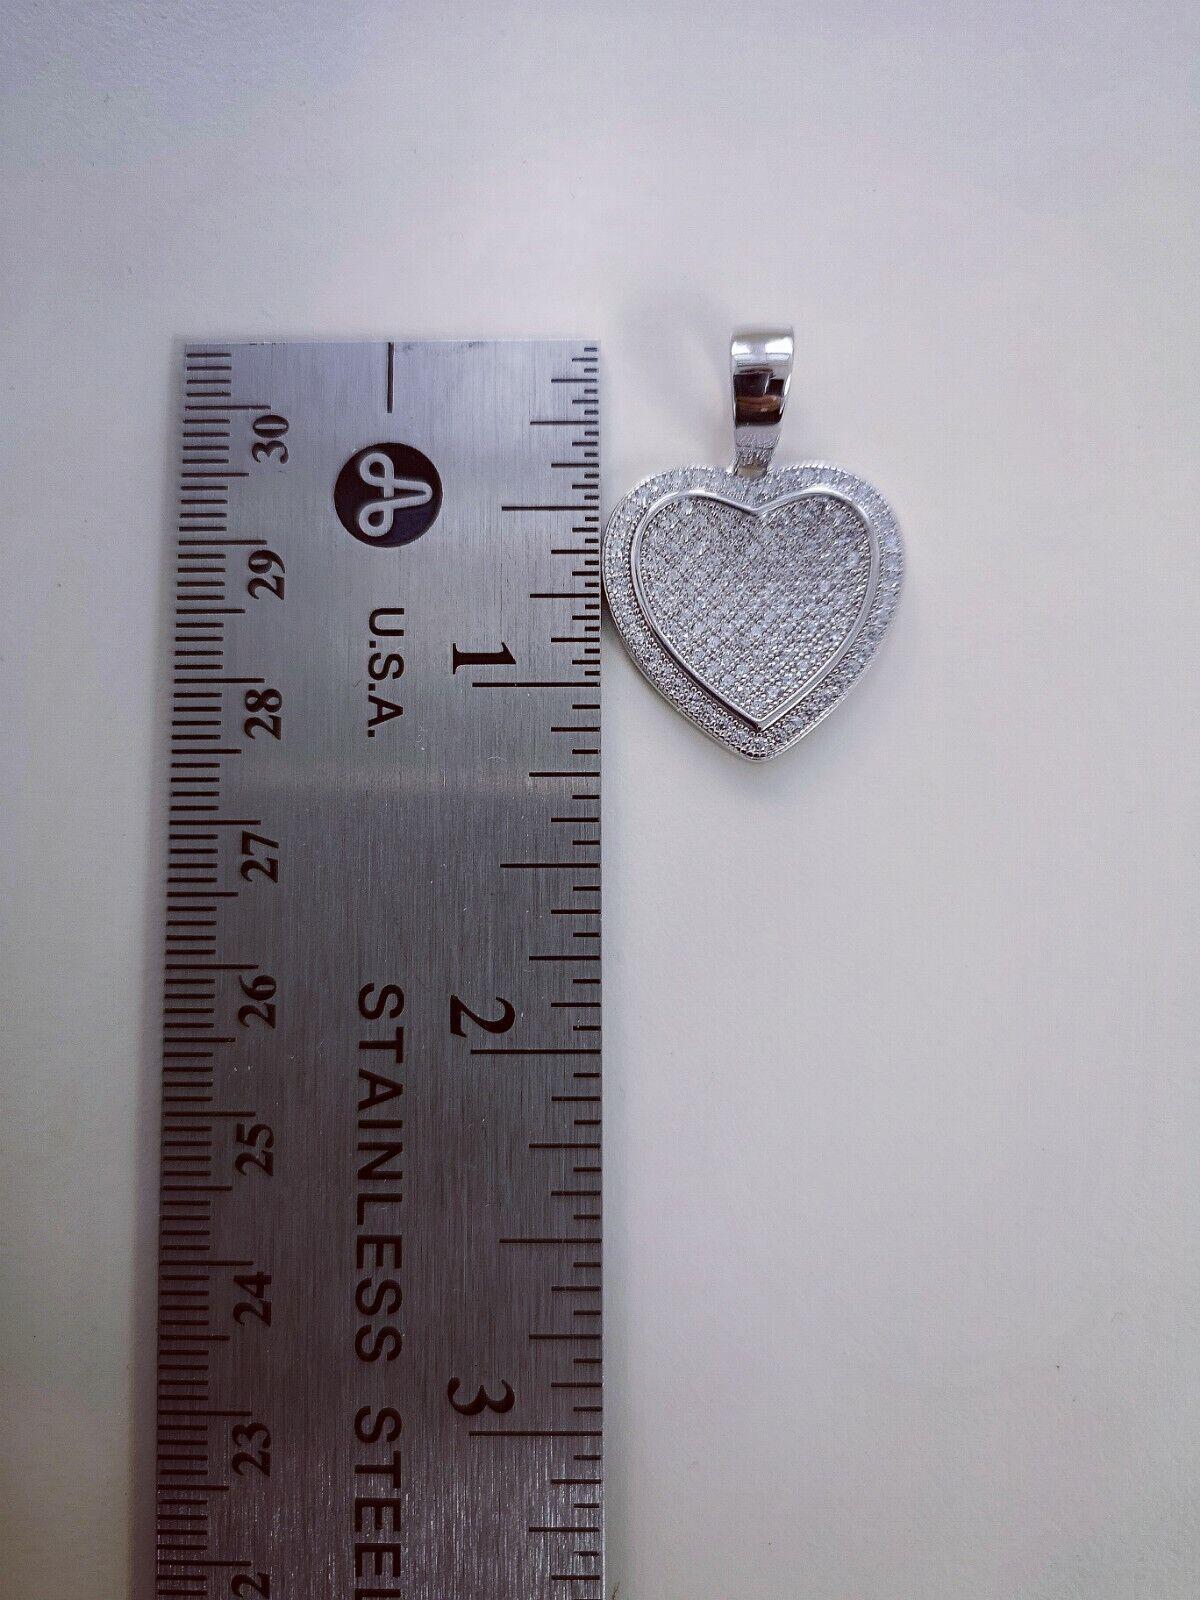 1 Ct Diamond pendant with Chain Woman's Heart Diamond Necklace 14K White Gold 3